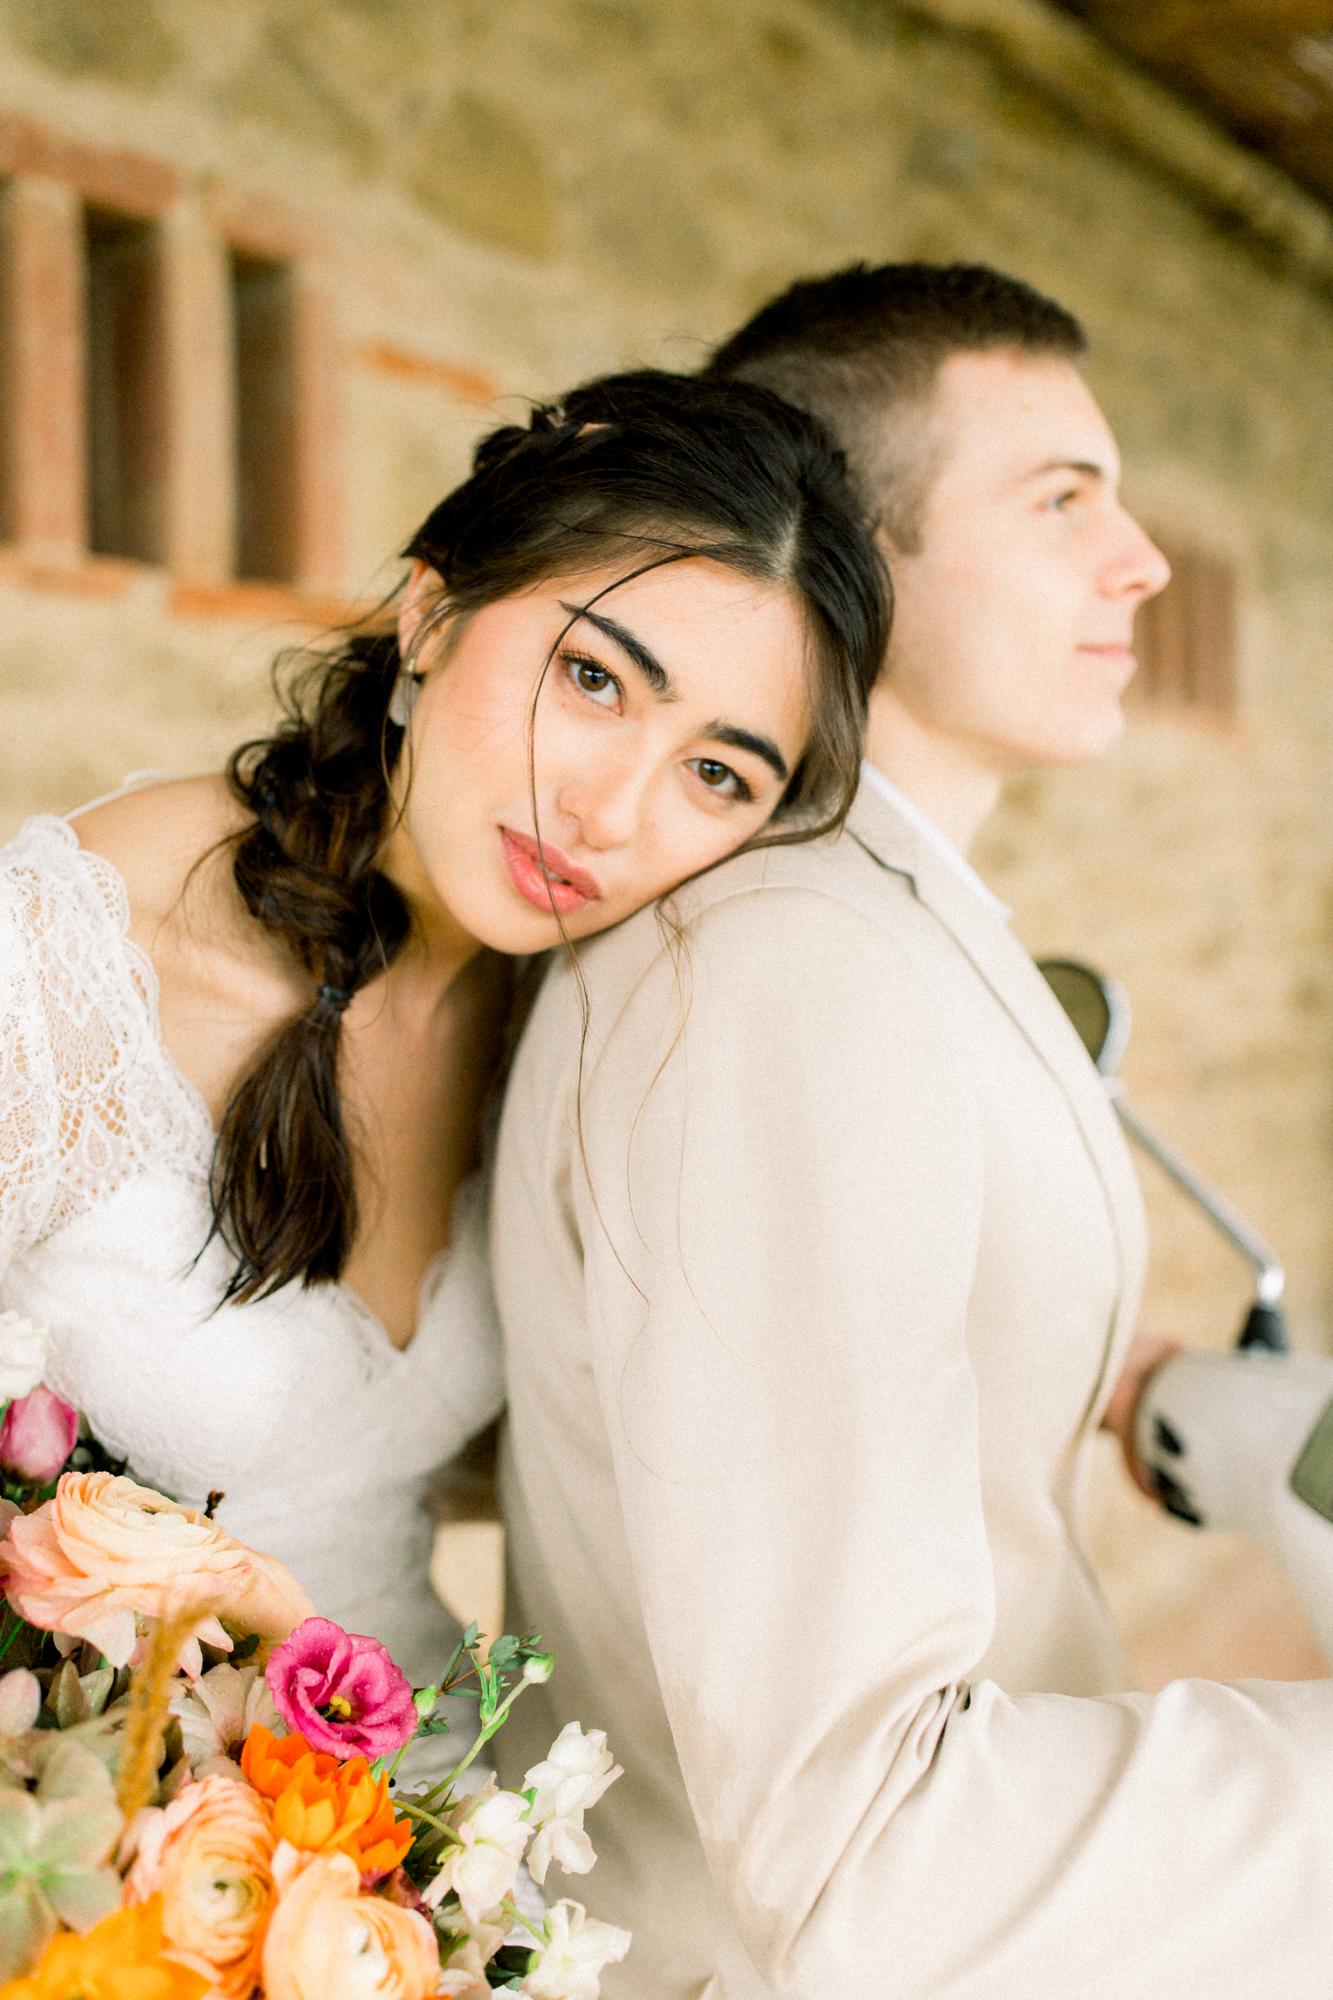 Tuscan Vespa Wedding - Britt LaShea-10.jpg